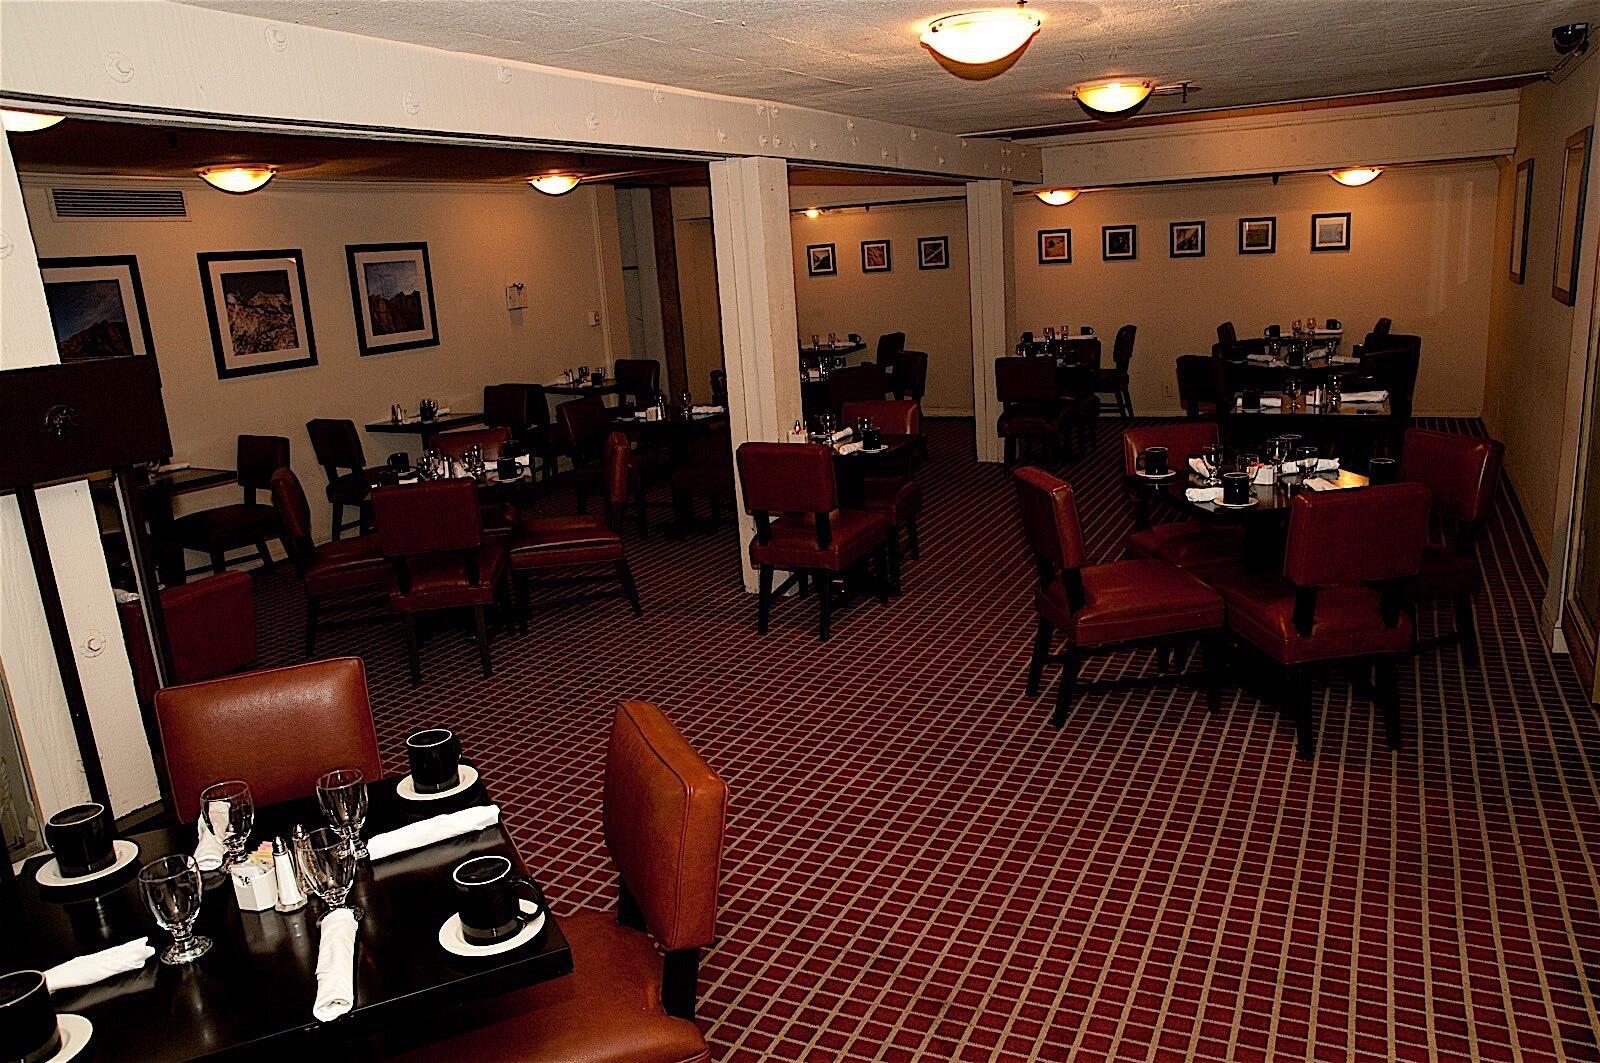 Dining at Hotel Fresno